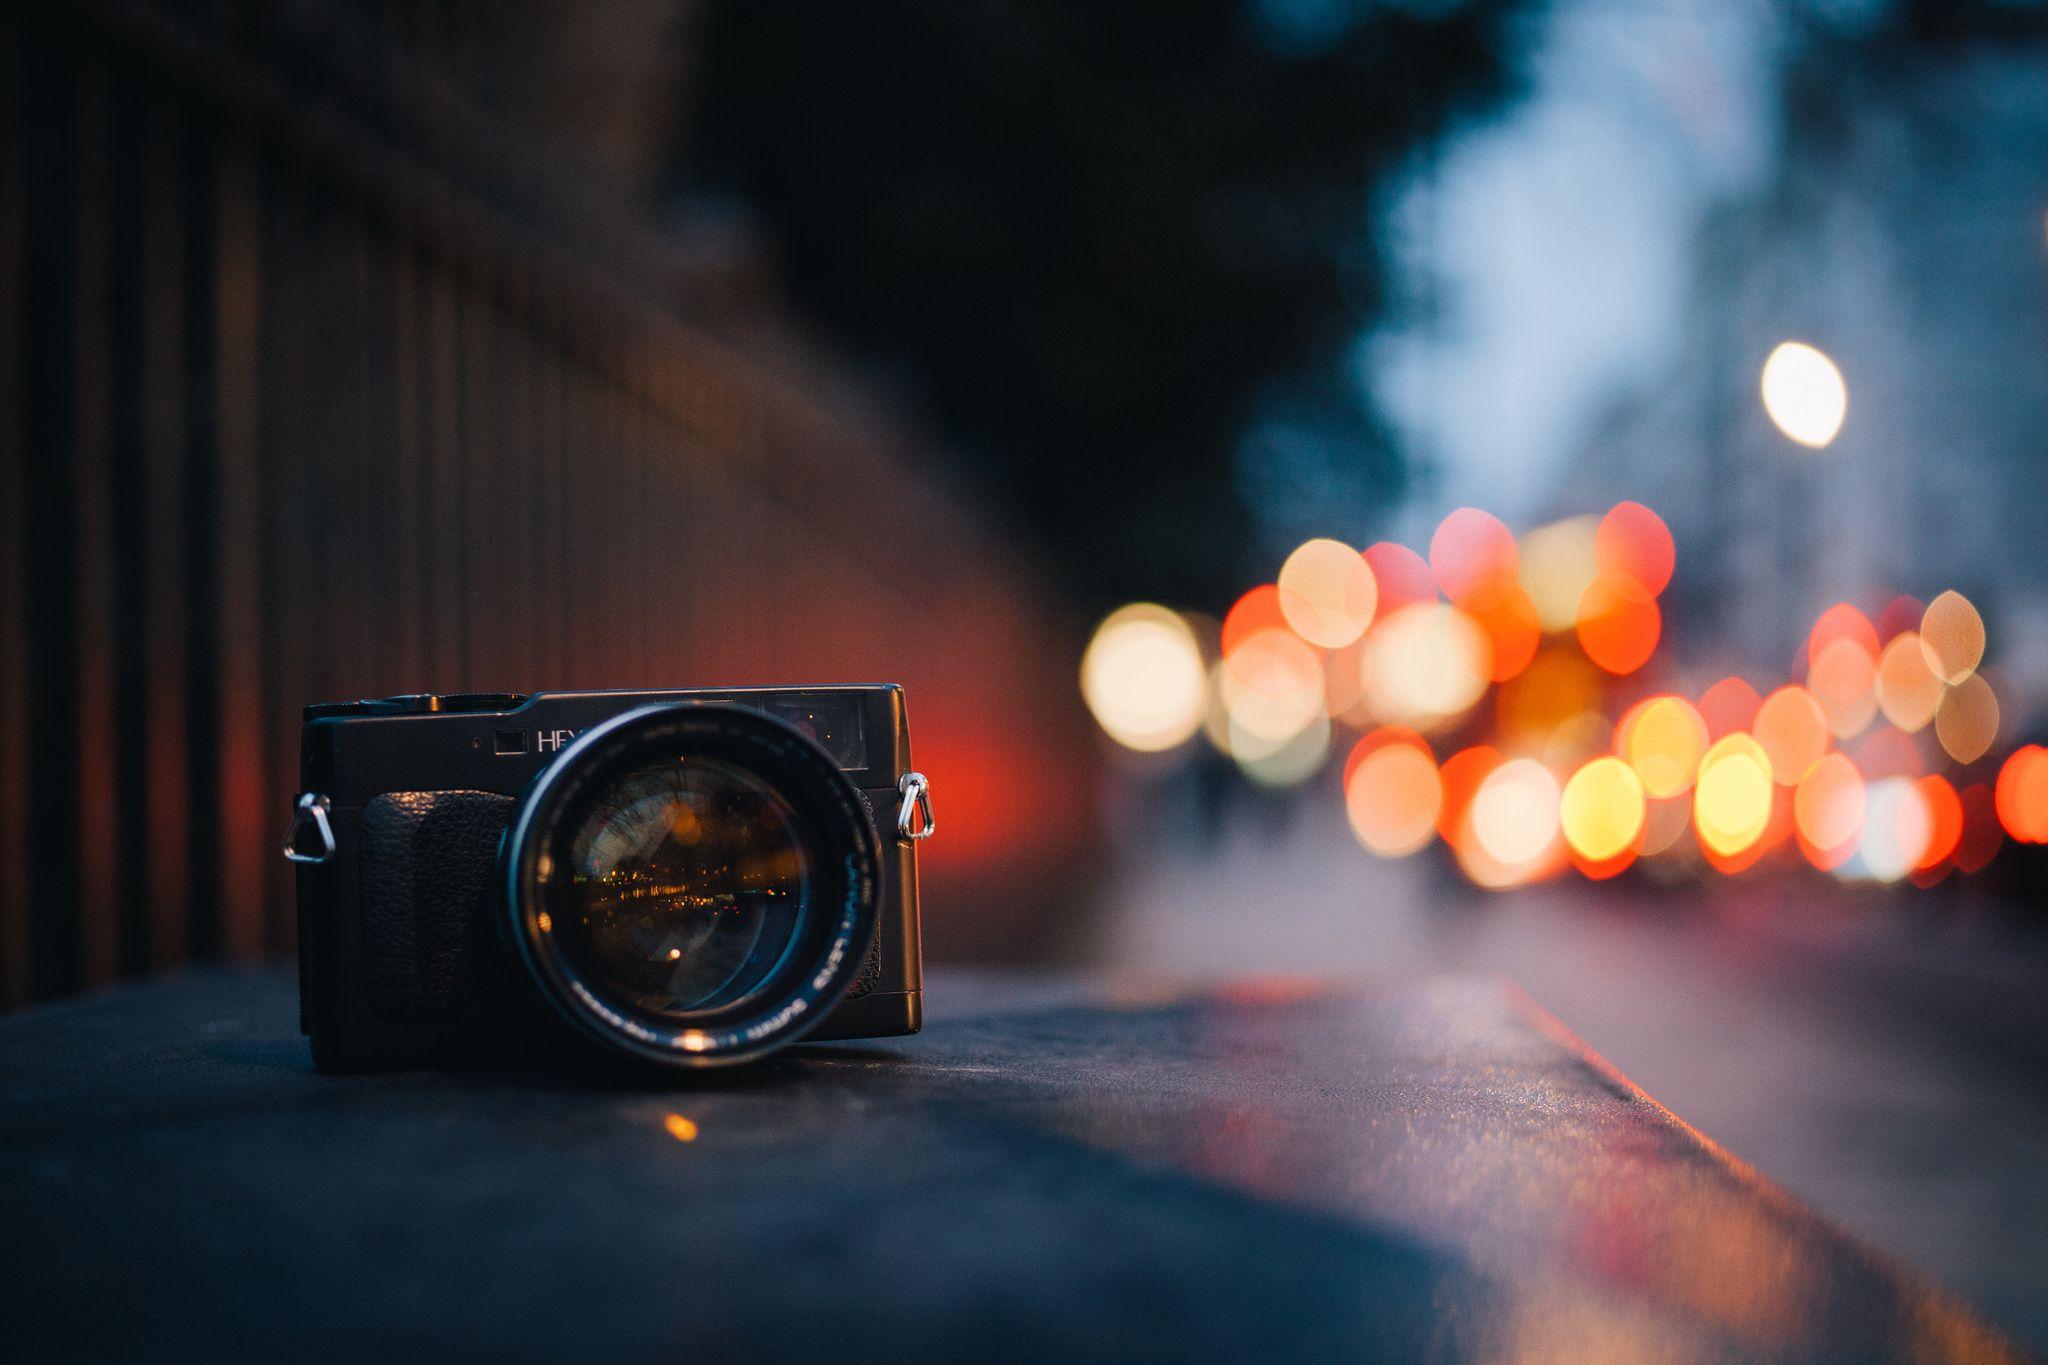 Hd wallpaper camera - Camera Hd Wallpapers Backgrounds Wallpaper 2048 1365 Camera Wallpaper 32 Wallpapers Adorable